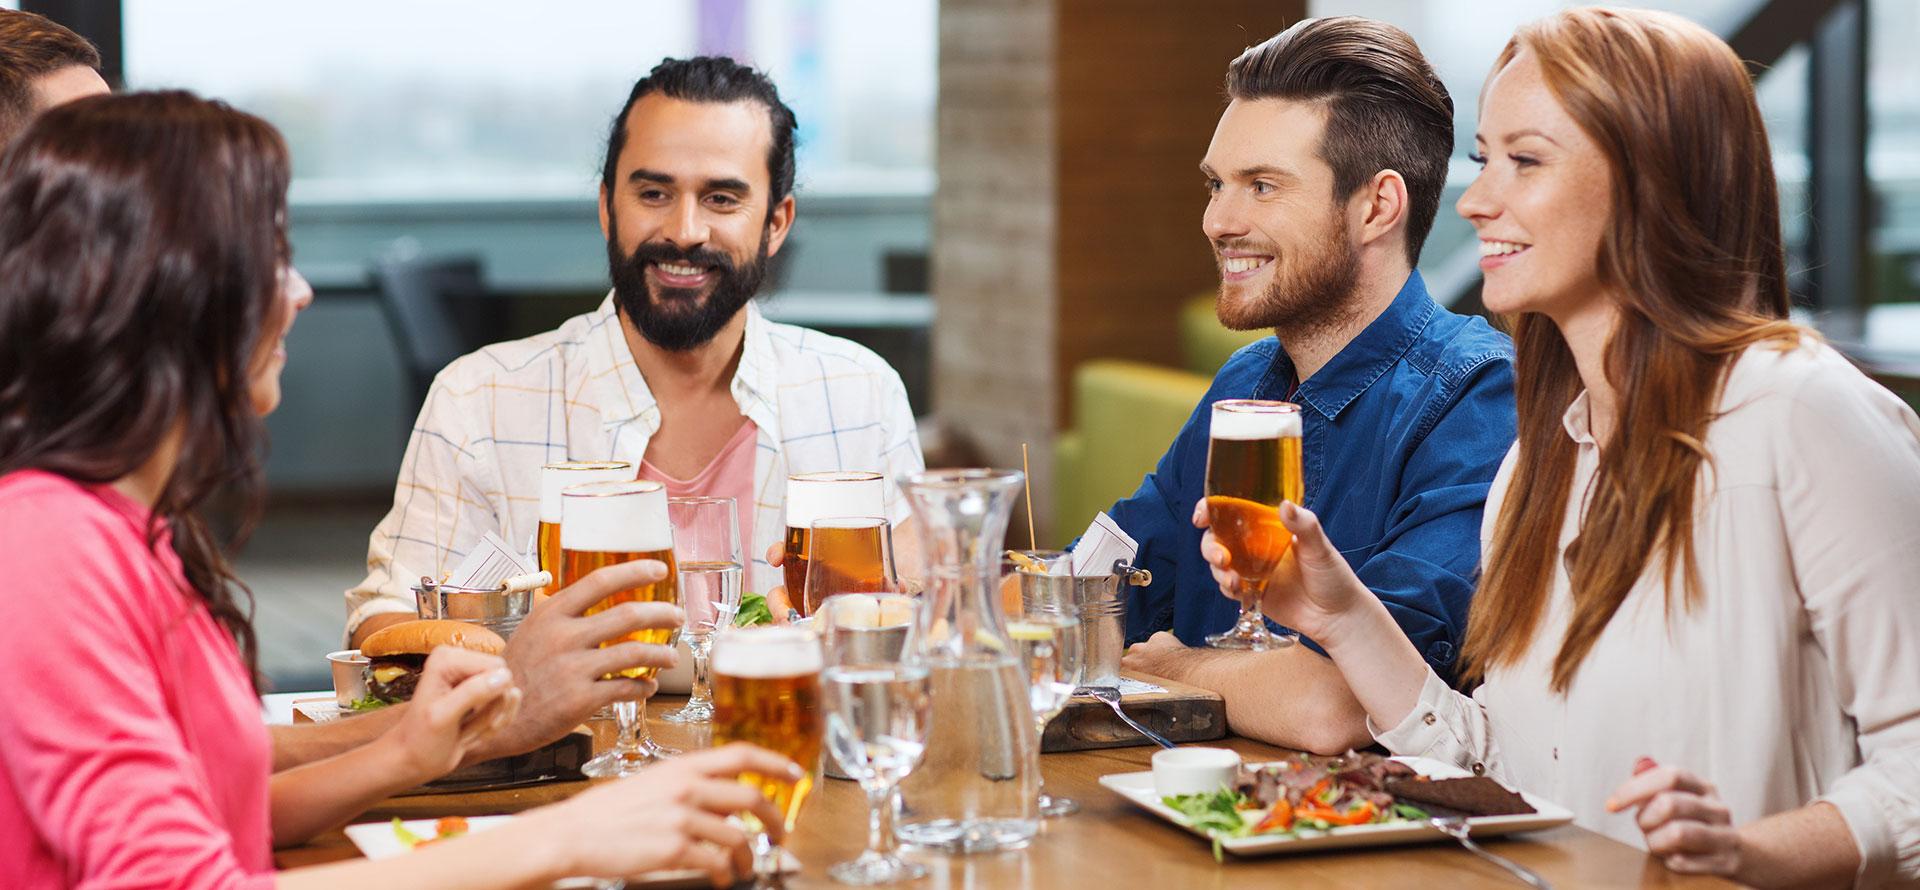 Beviresponsabile-alcol